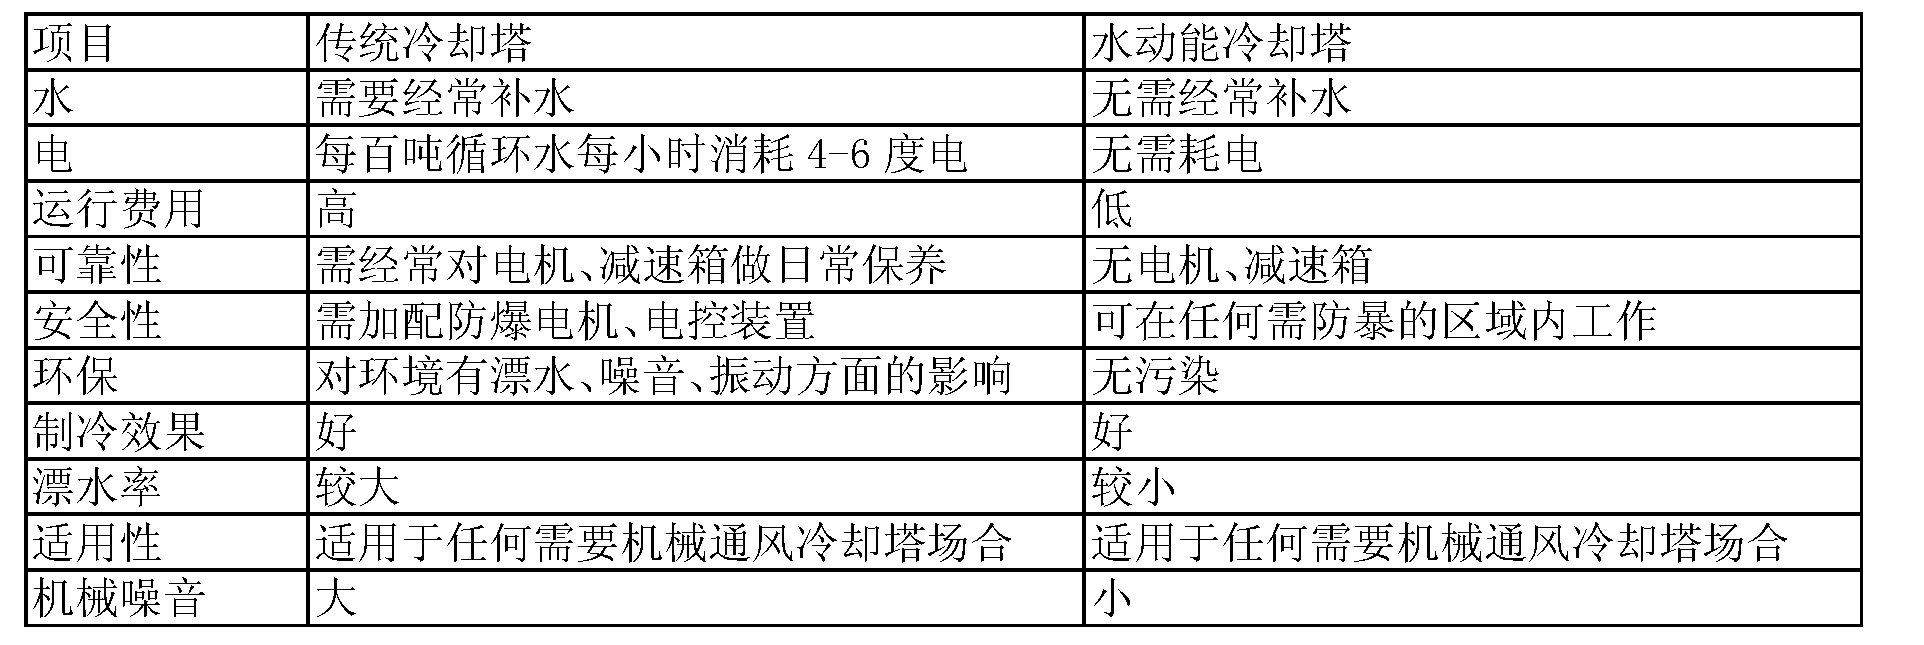 Figure CN204255127UD00051